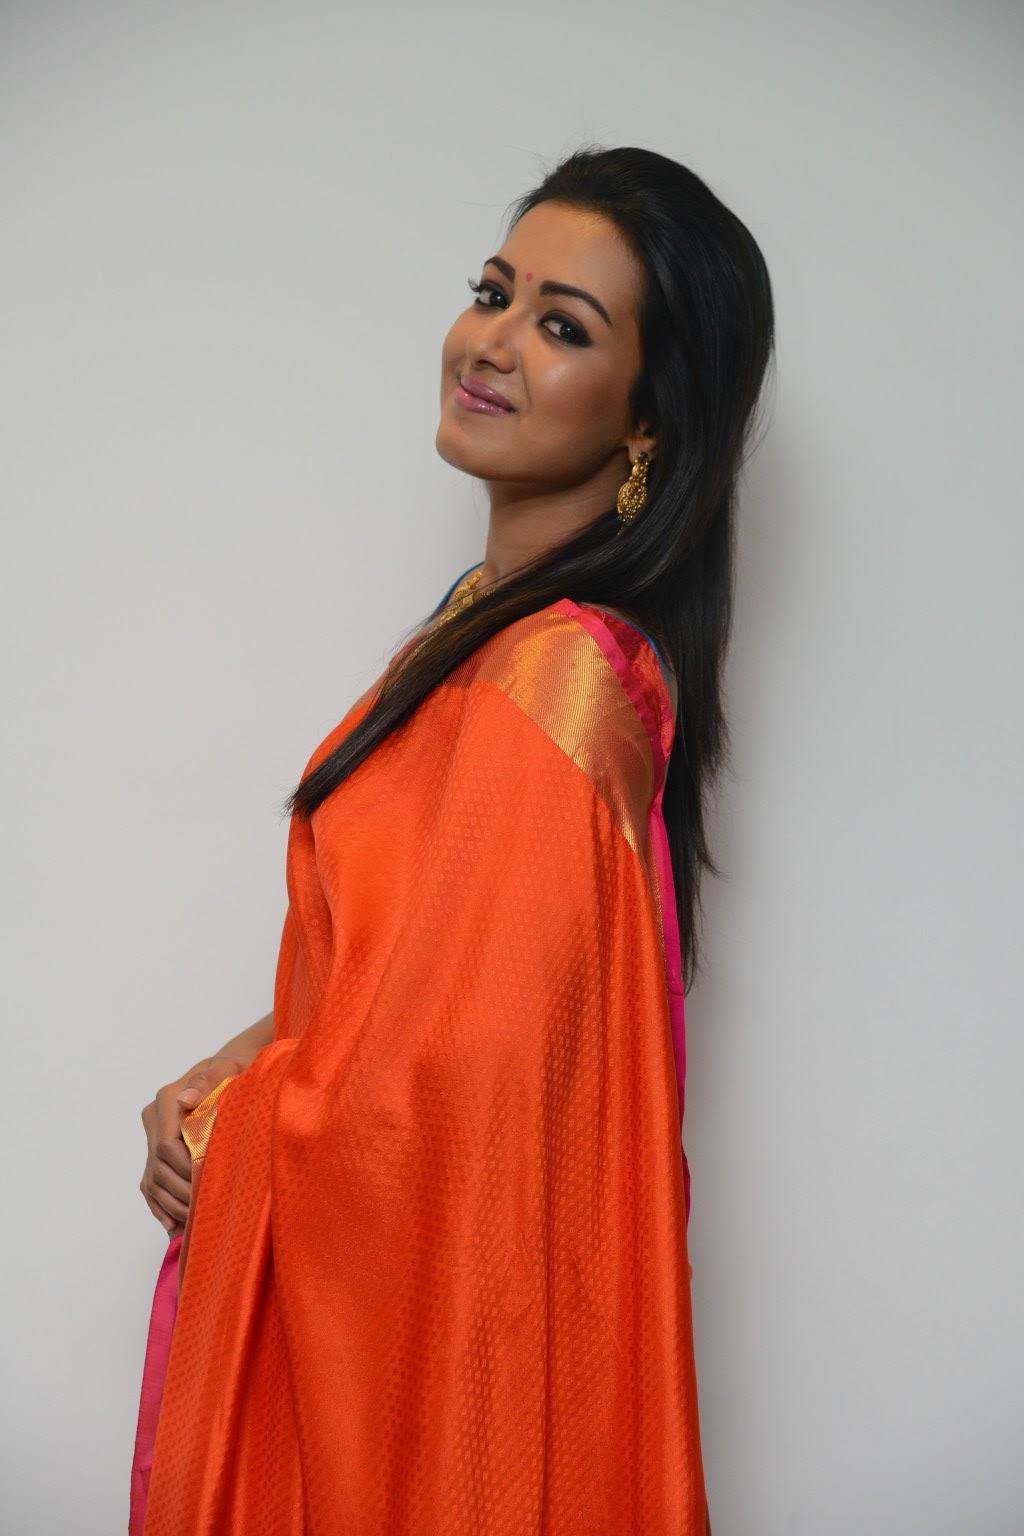 Desi Actress Pictures Catherine Tresa Look Beautiful In -6544